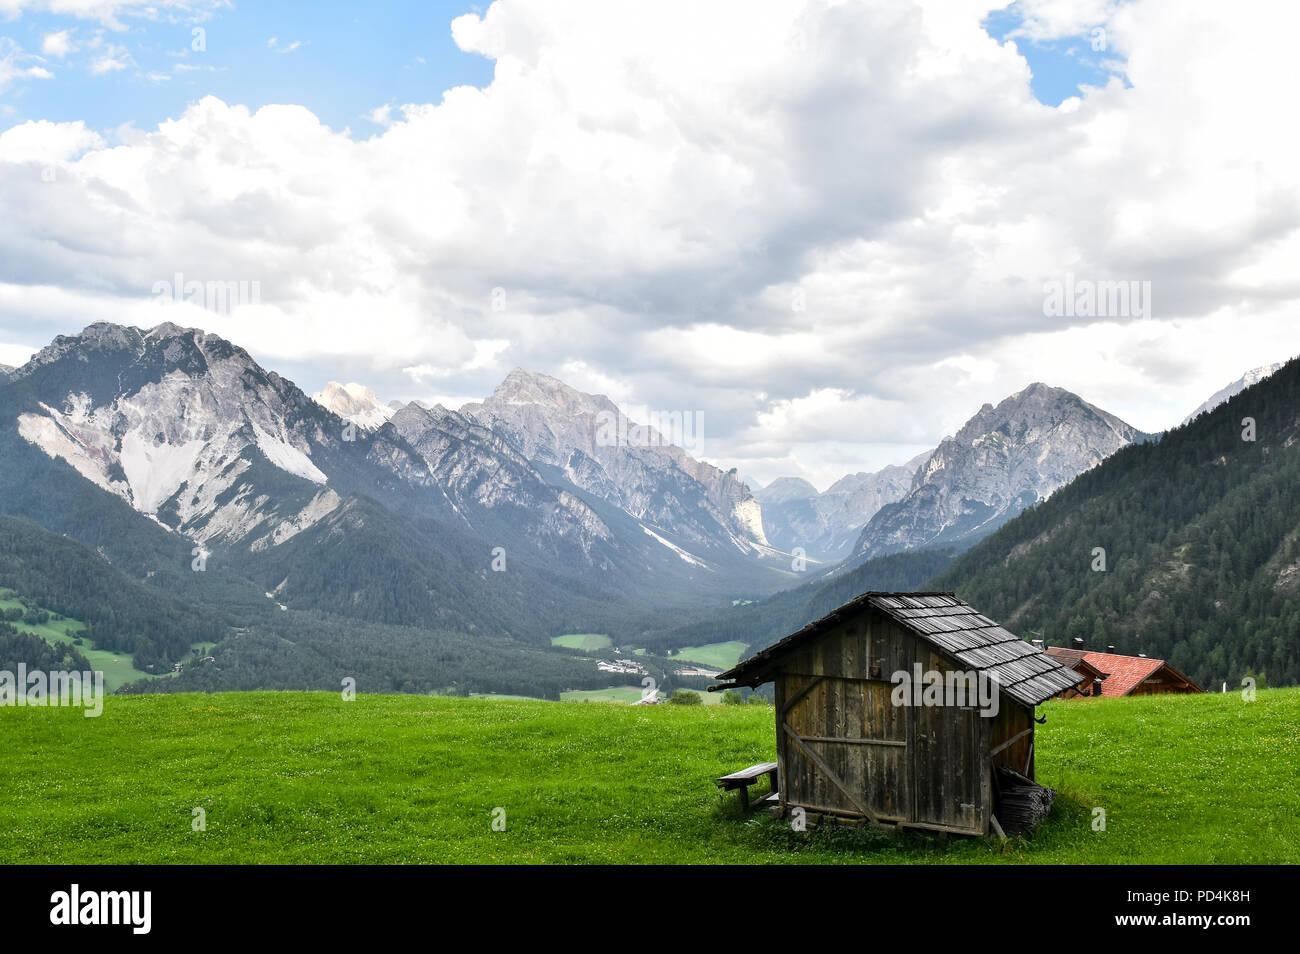 Beautiful view of idyllic alpine mountain scenery with